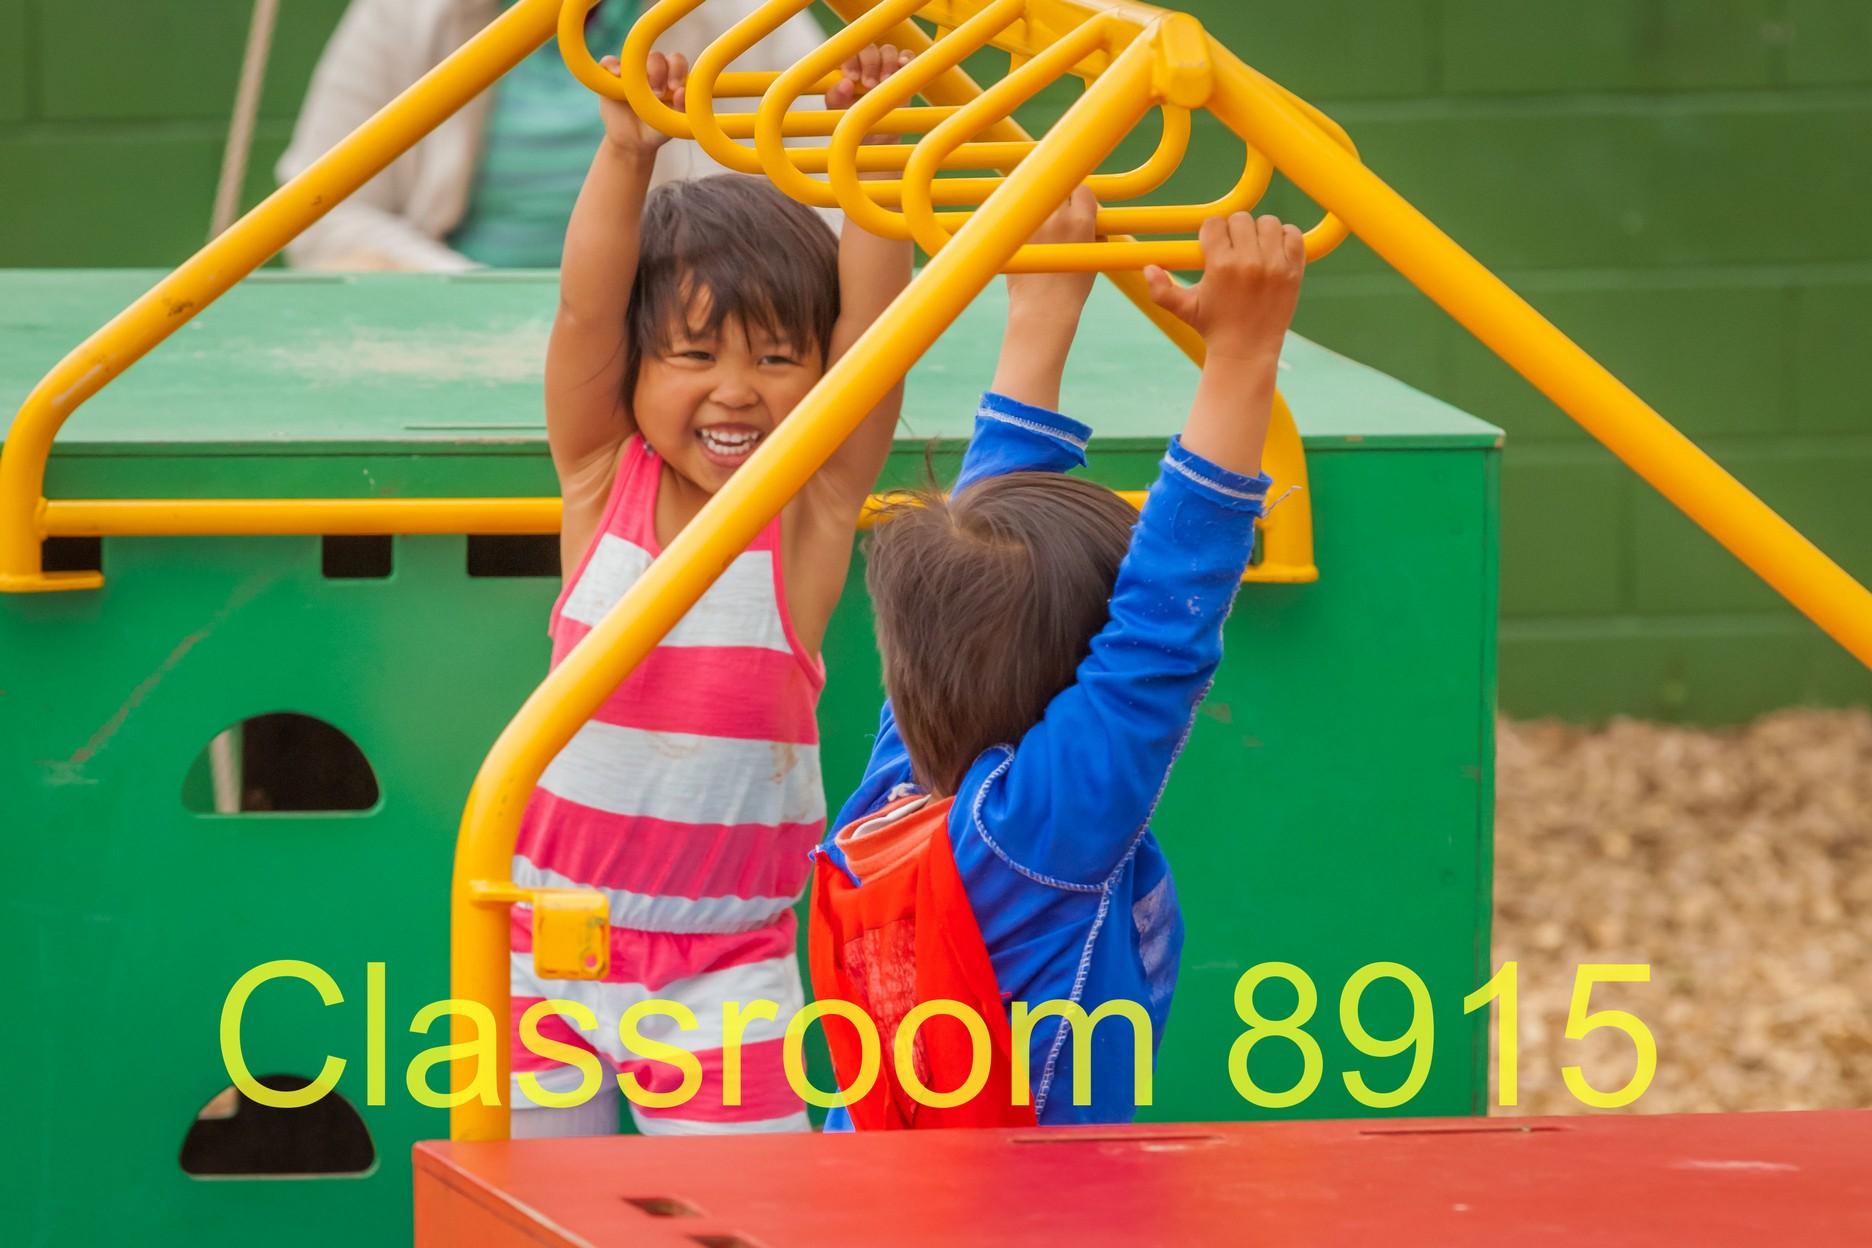 Classroom 8915